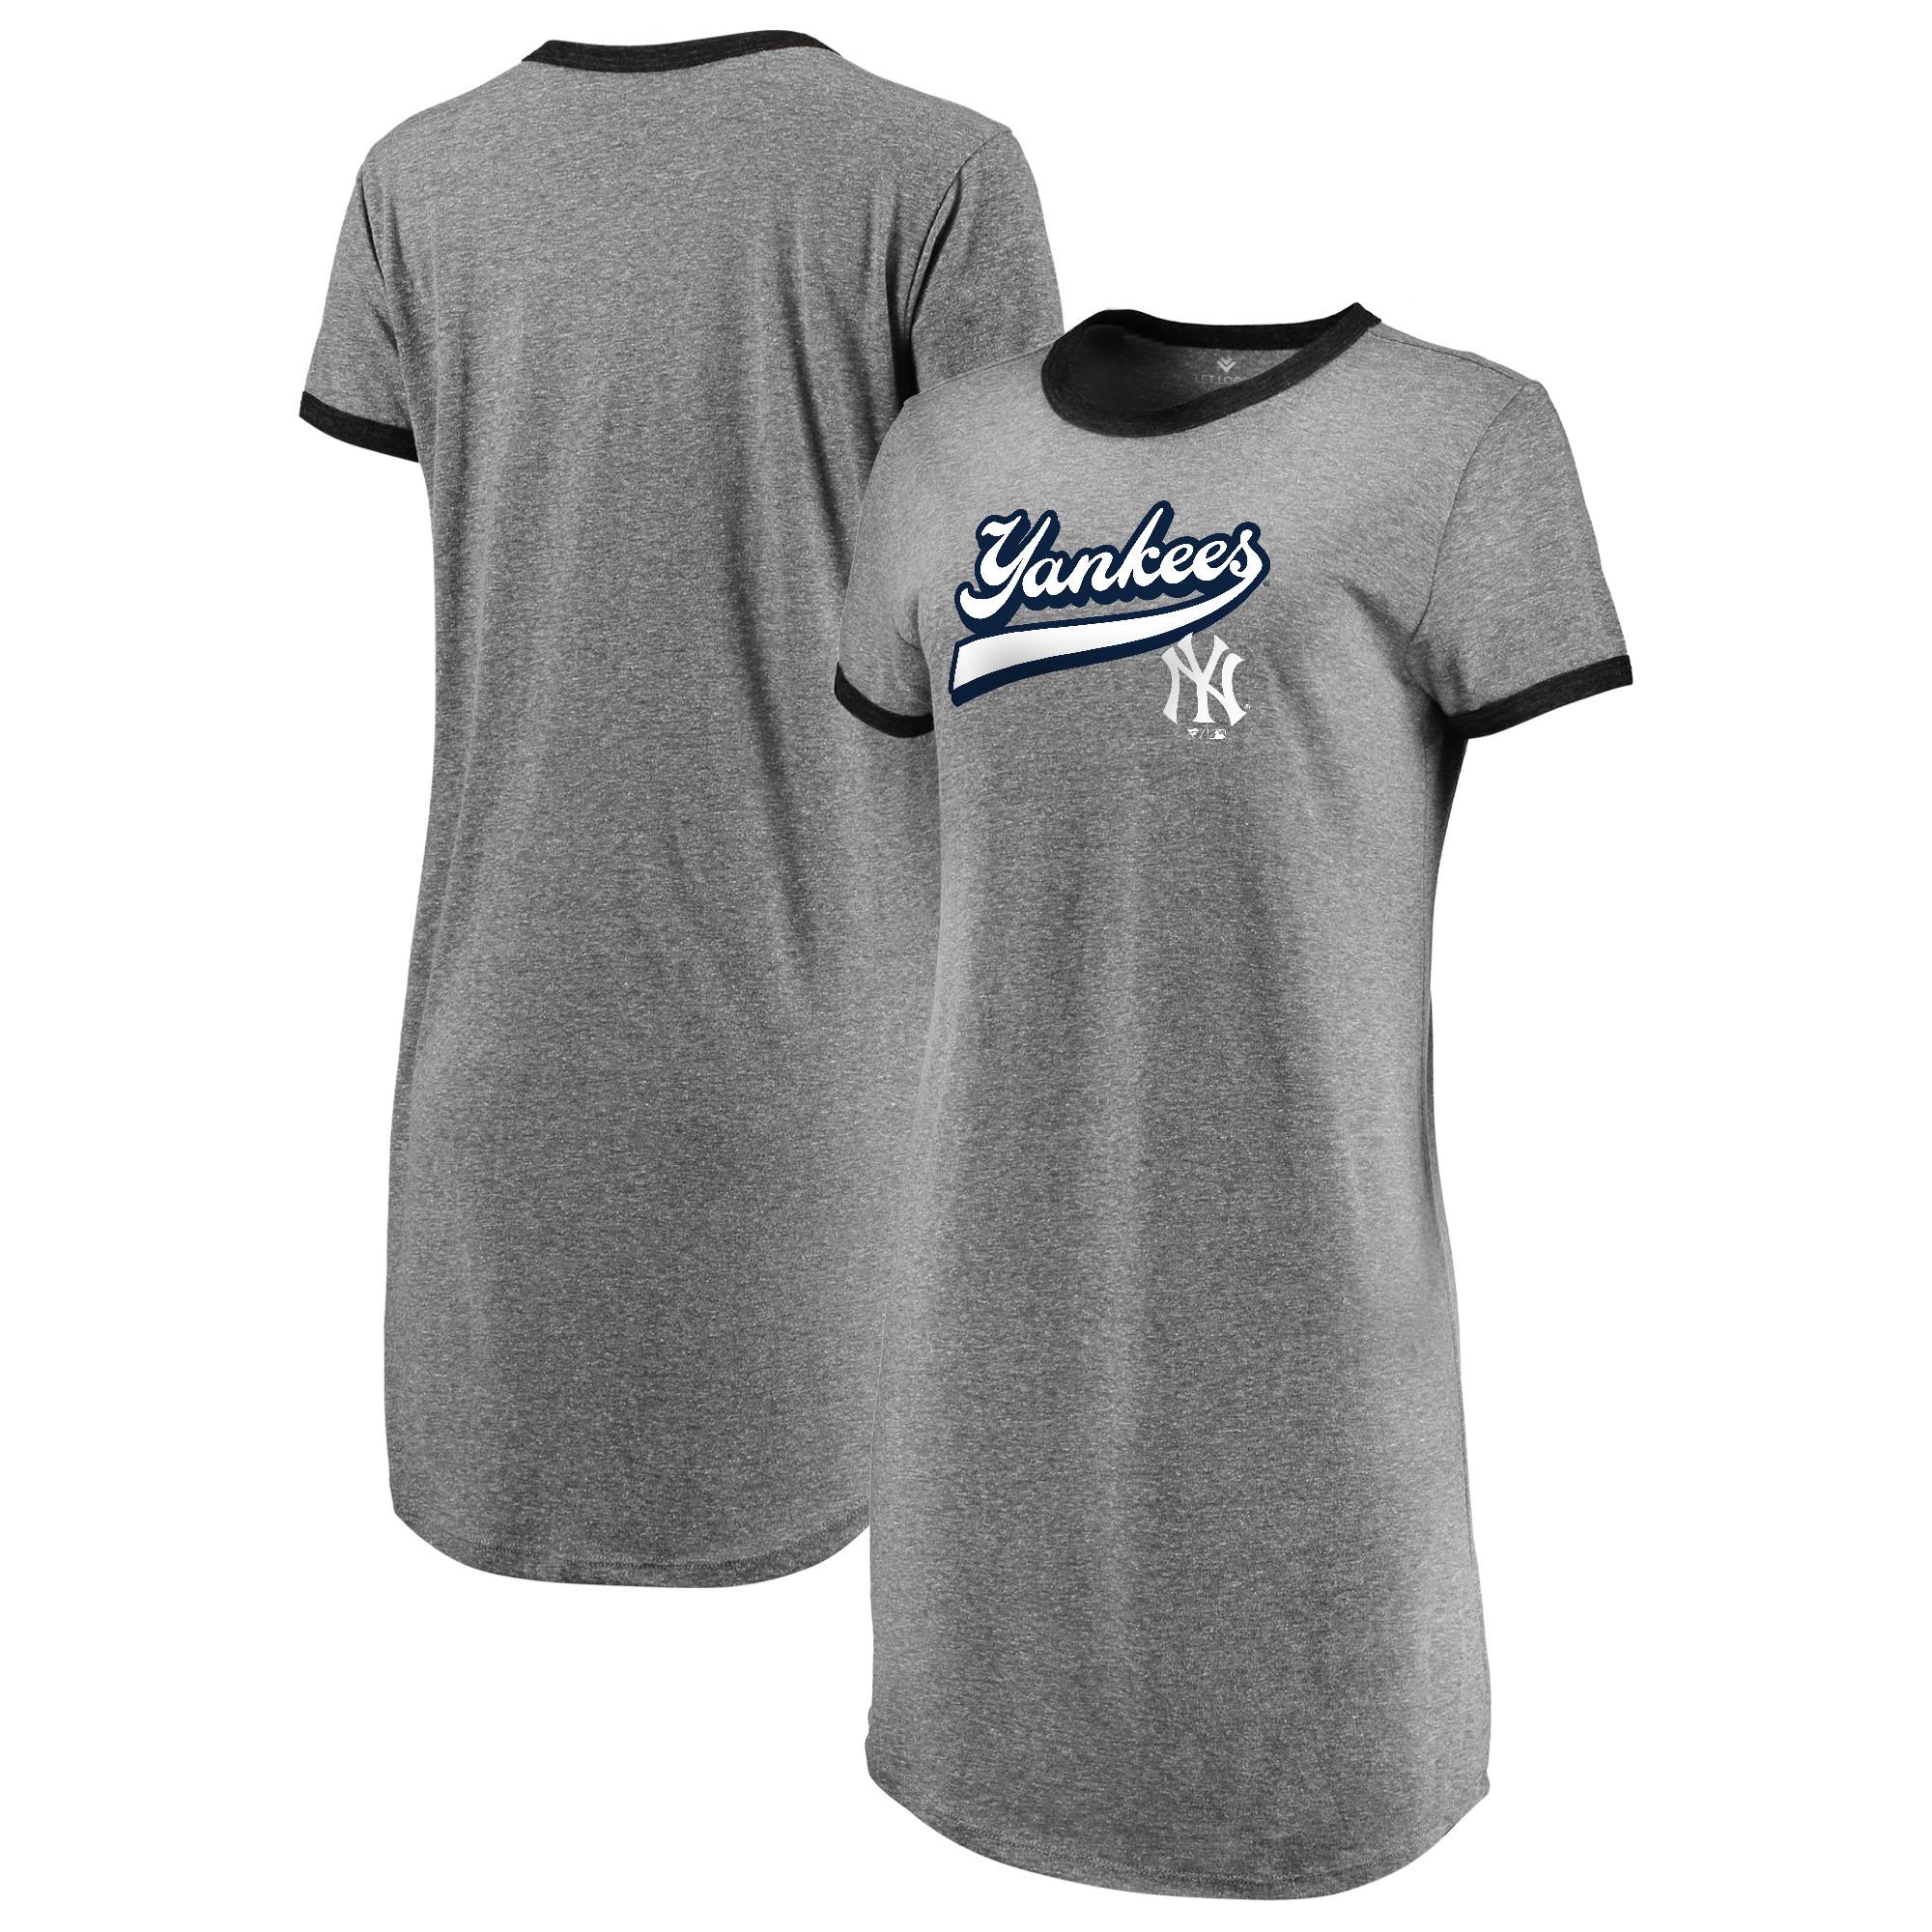 New York Yankees Fanatics Branded Women s Tri-Blend T-Shirt Dress -  Heathered Gray - Walmart.com 990a213fc2f